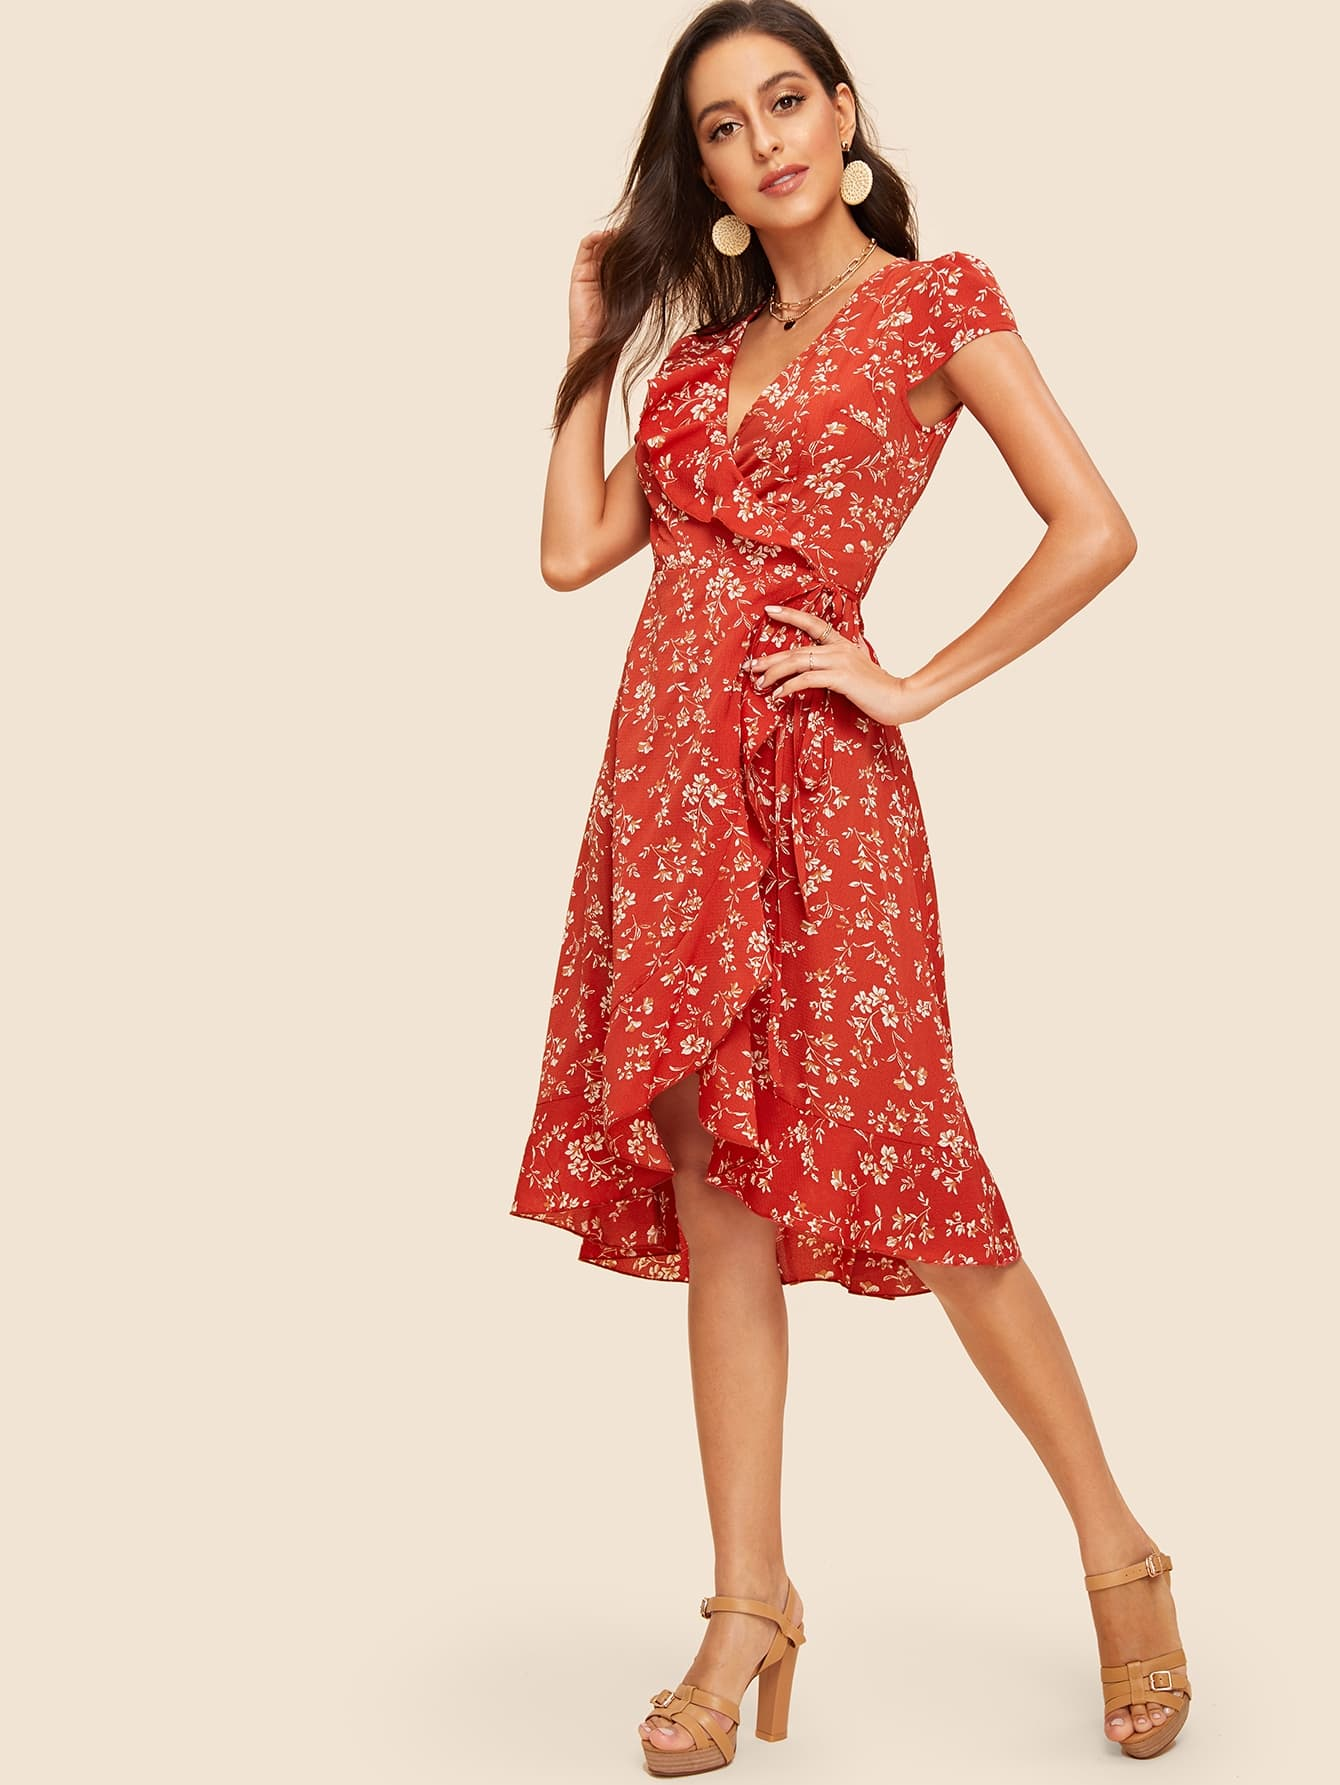 72c5d7b721 60s Botanical Print Ruffle Trim Surplice Dress | SHEIN